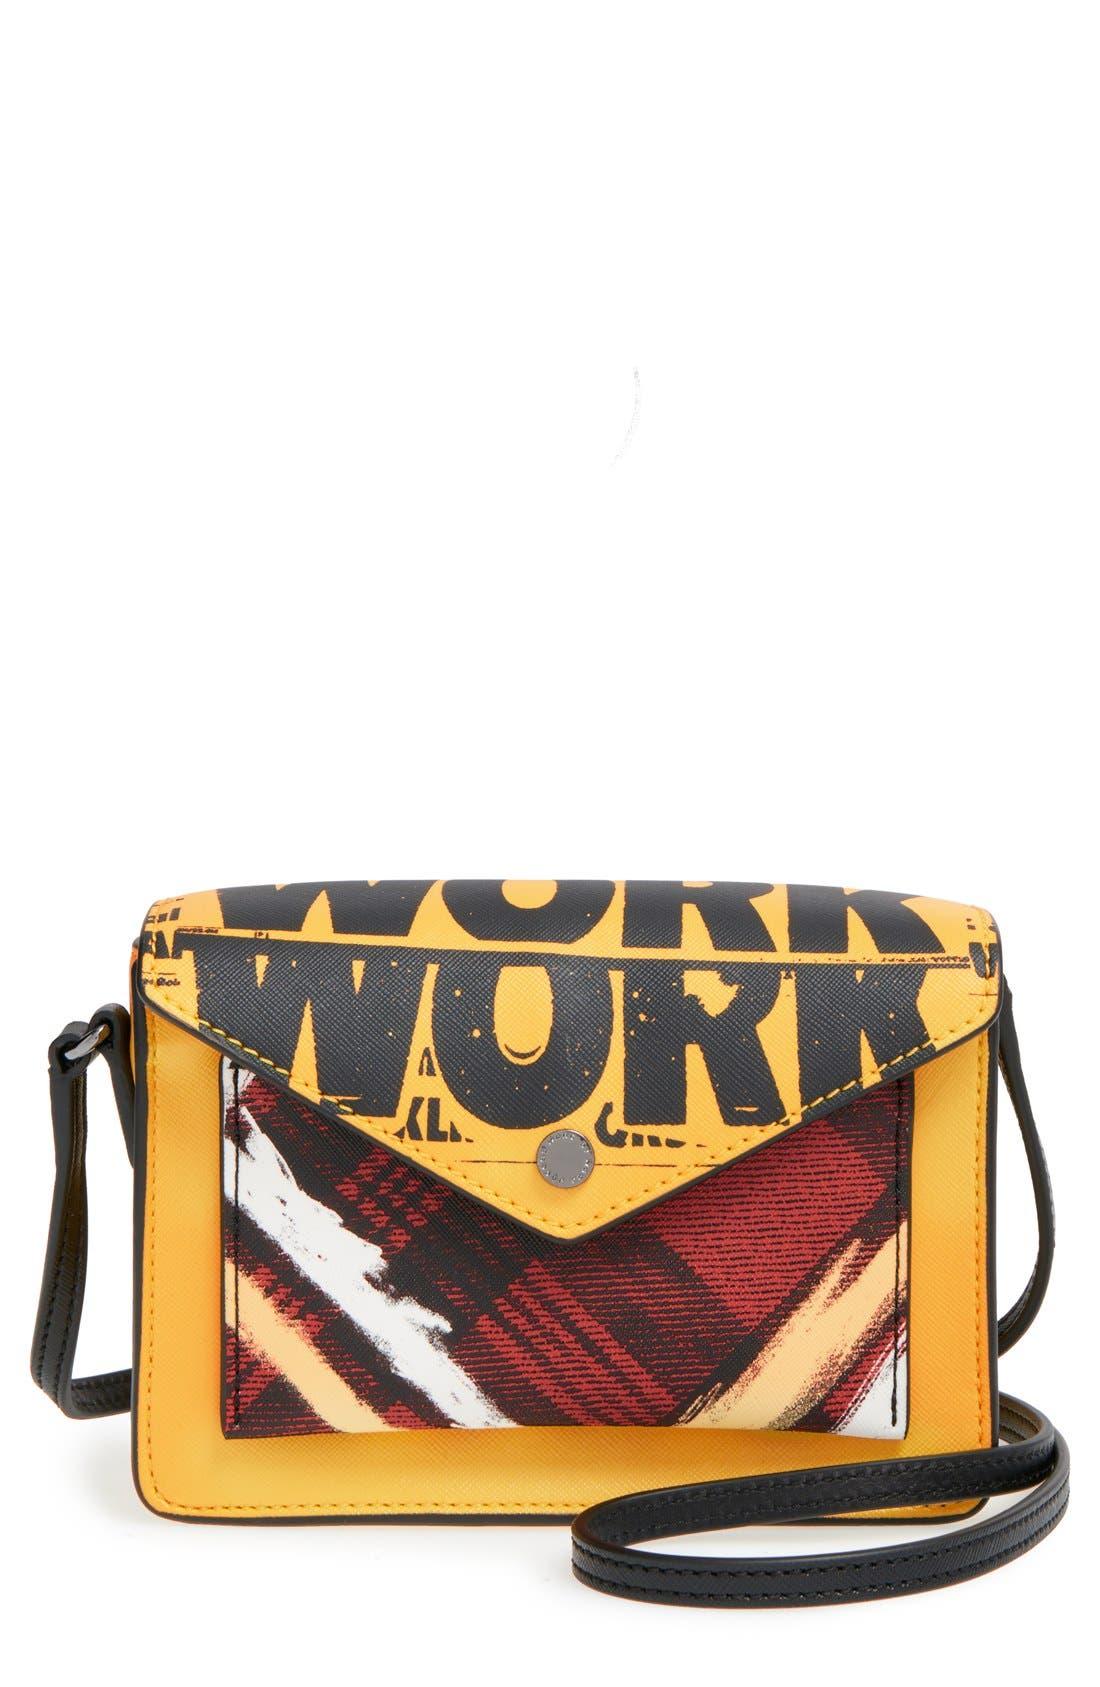 Main Image - MARC BY MARC JACOBS 'Metropoli' Envelope Crossbody Bag